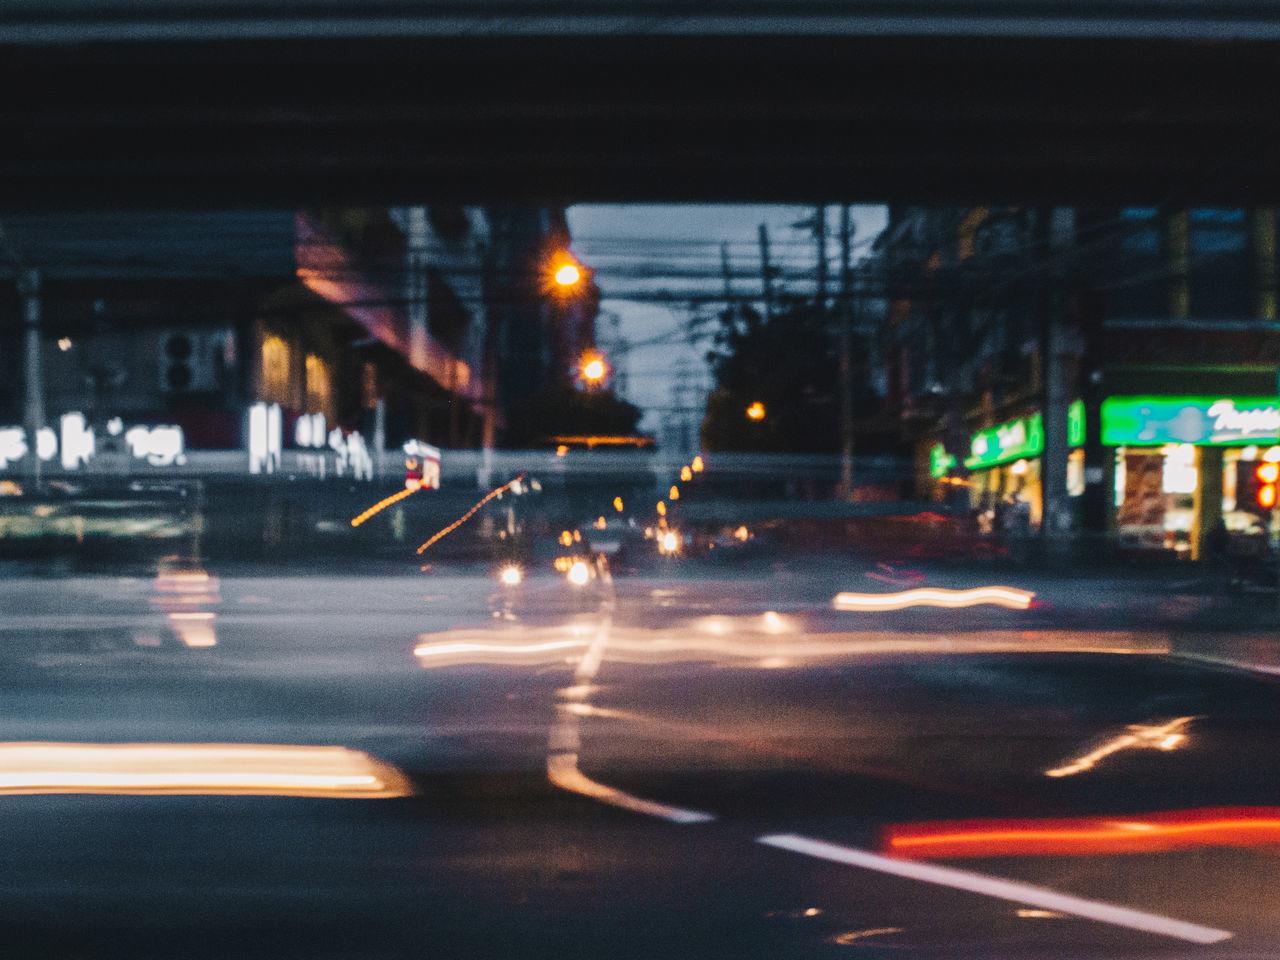 Rush hour delay Street Illuminated Night Car Transportation City Life Chasinglight Long Exposure Live For The Story The Street Photographer - 2017 EyeEm Awards Taftavenue Olympus OLYMPUS PEN E-P3